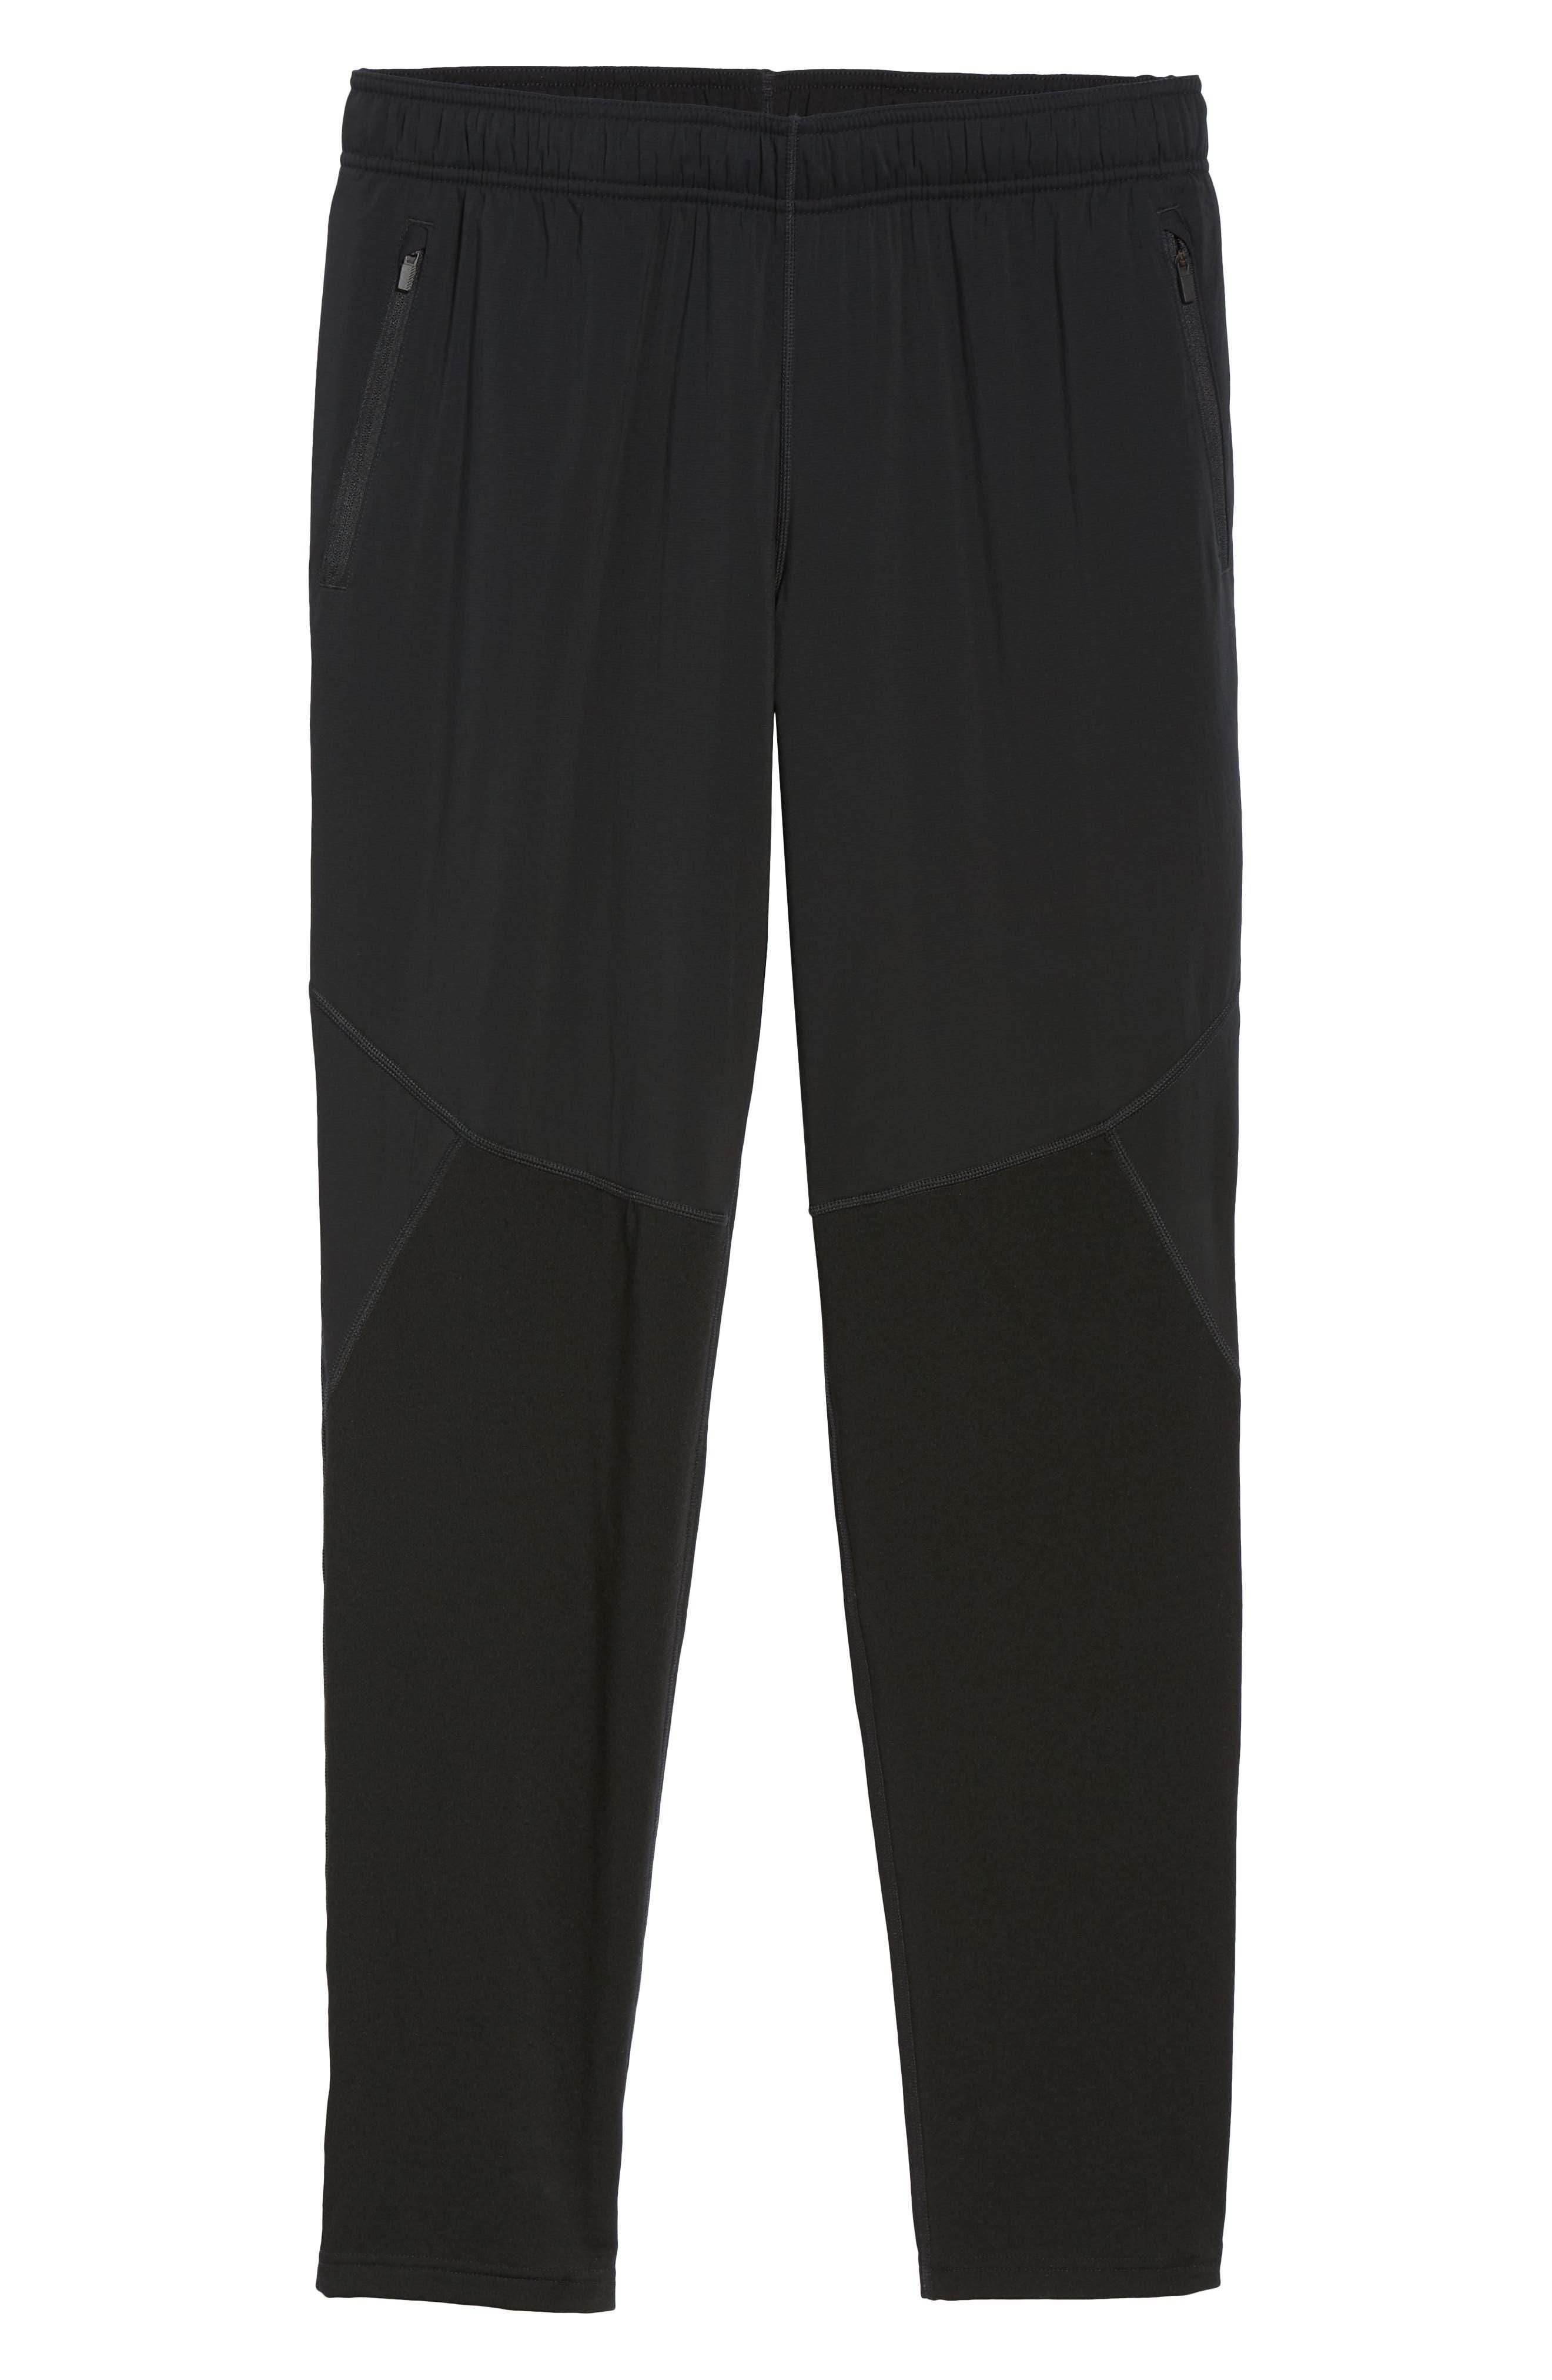 Tech Trainer Hybrid Sport Pants,                             Alternate thumbnail 6, color,                             BLACK